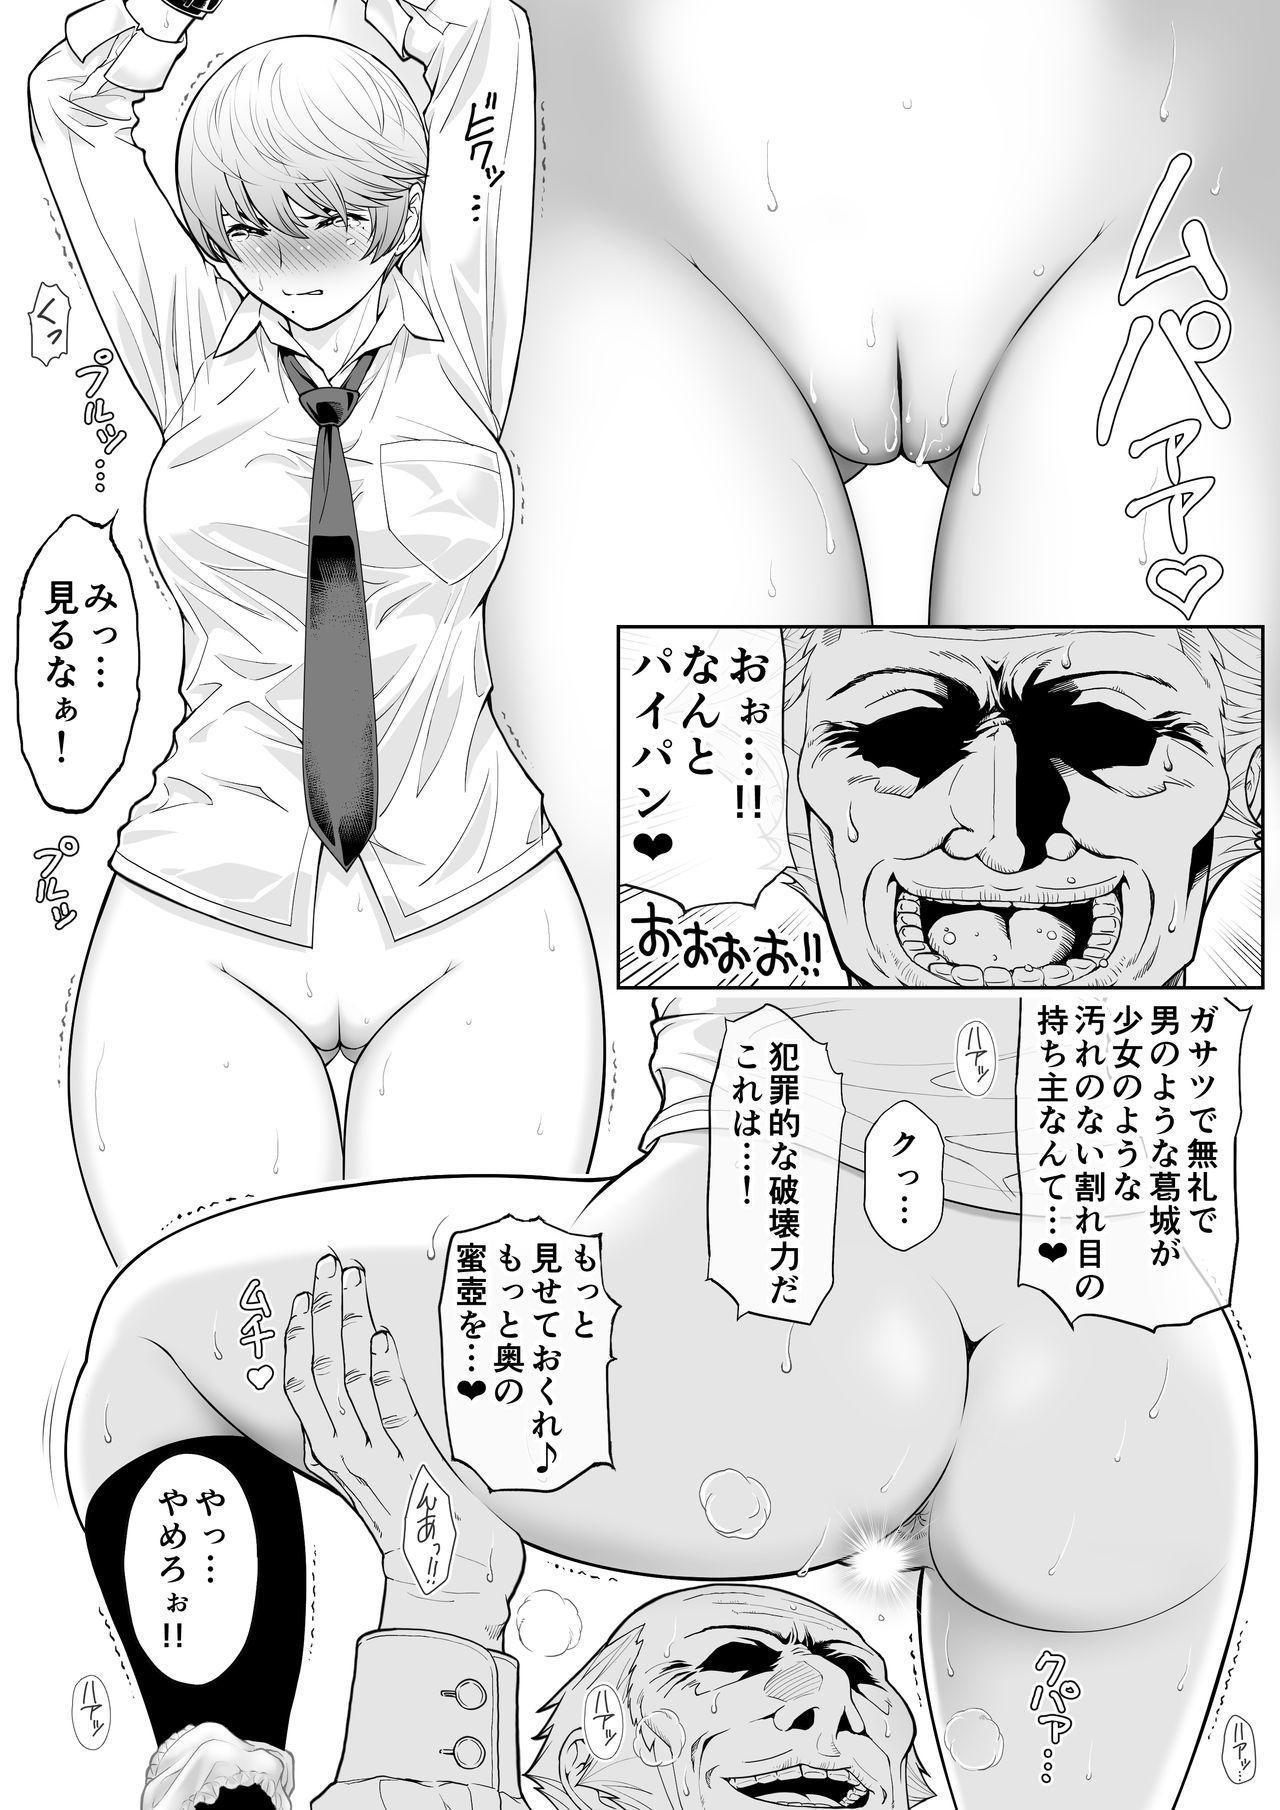 Namaiki mmusume ni tsuyo ● ikīki jugyō 12